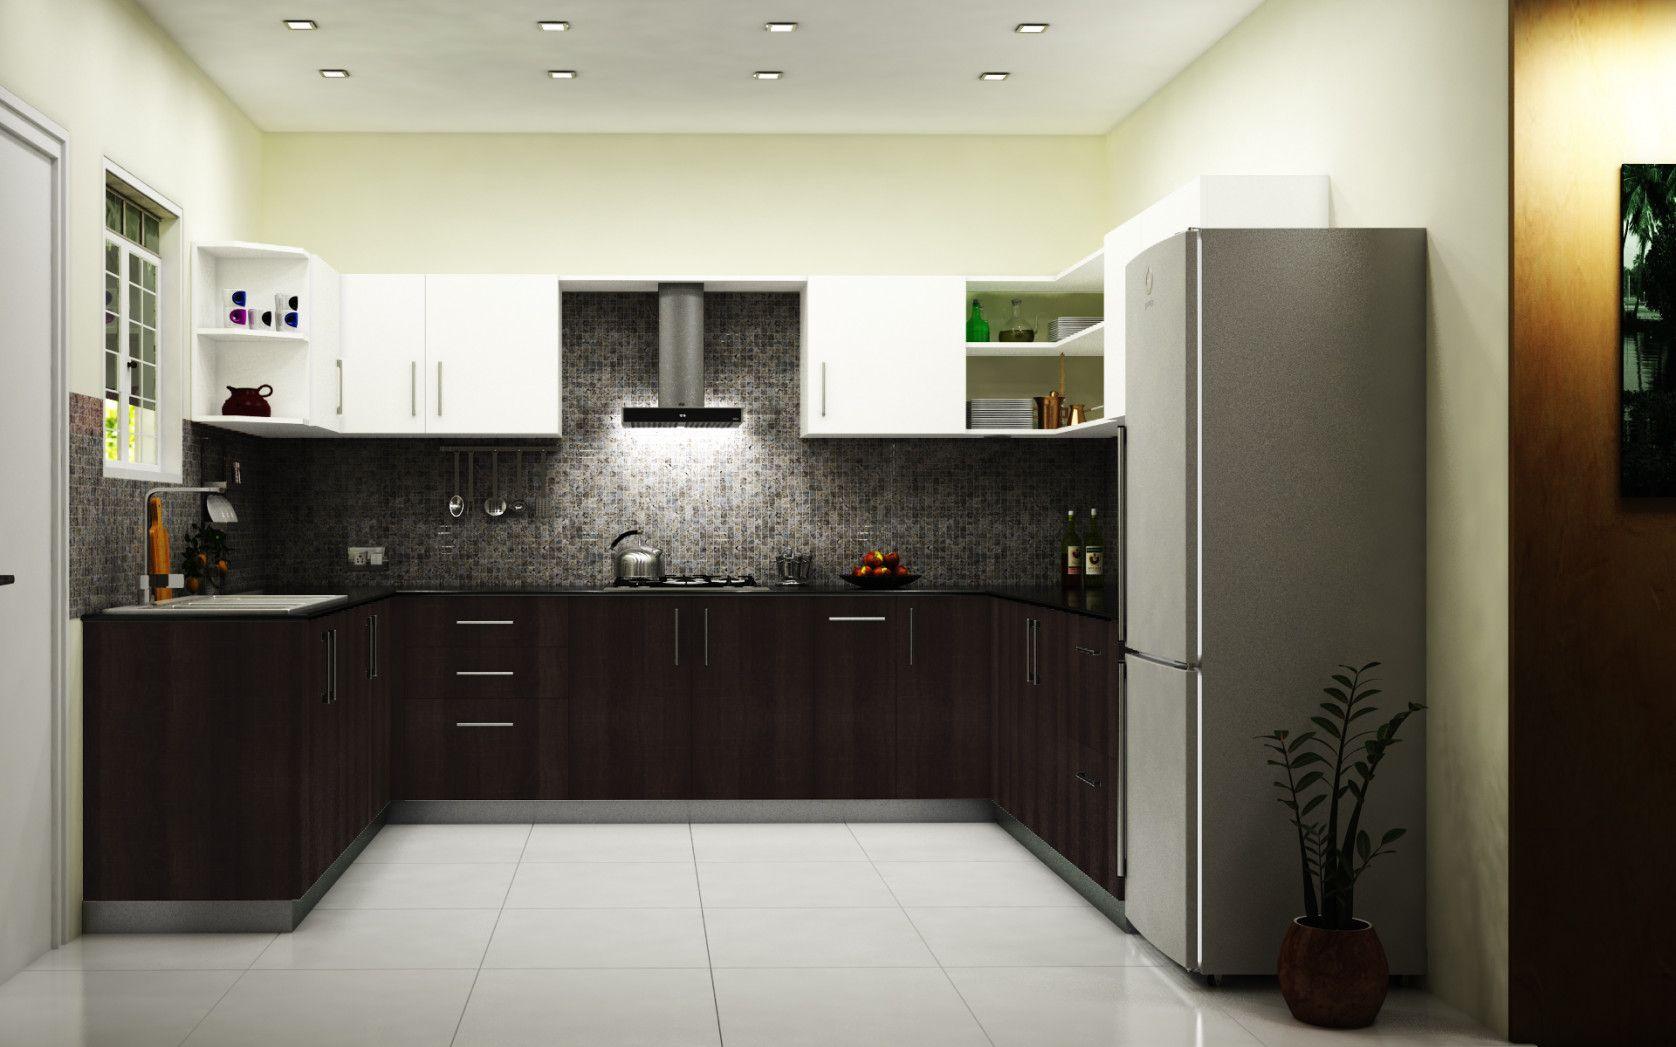 70 Modular Kitchen Cabinets India Apartment Kitchen Cabinet Ideas Check More At Modular Kitchen Design Interior Design Kitchen Small Interior Design Kitchen